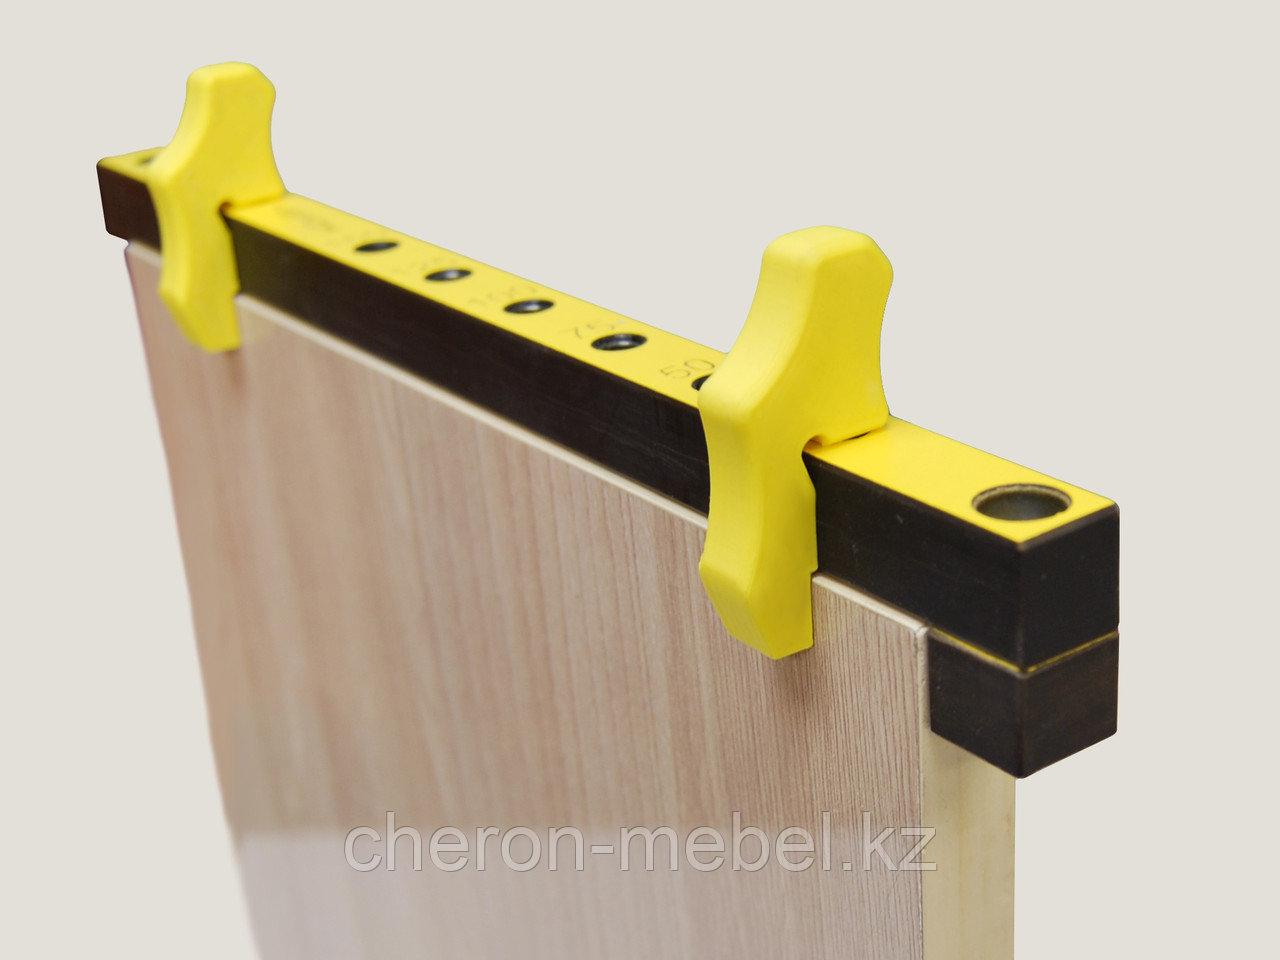 Упор переходник для кондуктора втулки 5 мм (для плиты 18 мм). ,